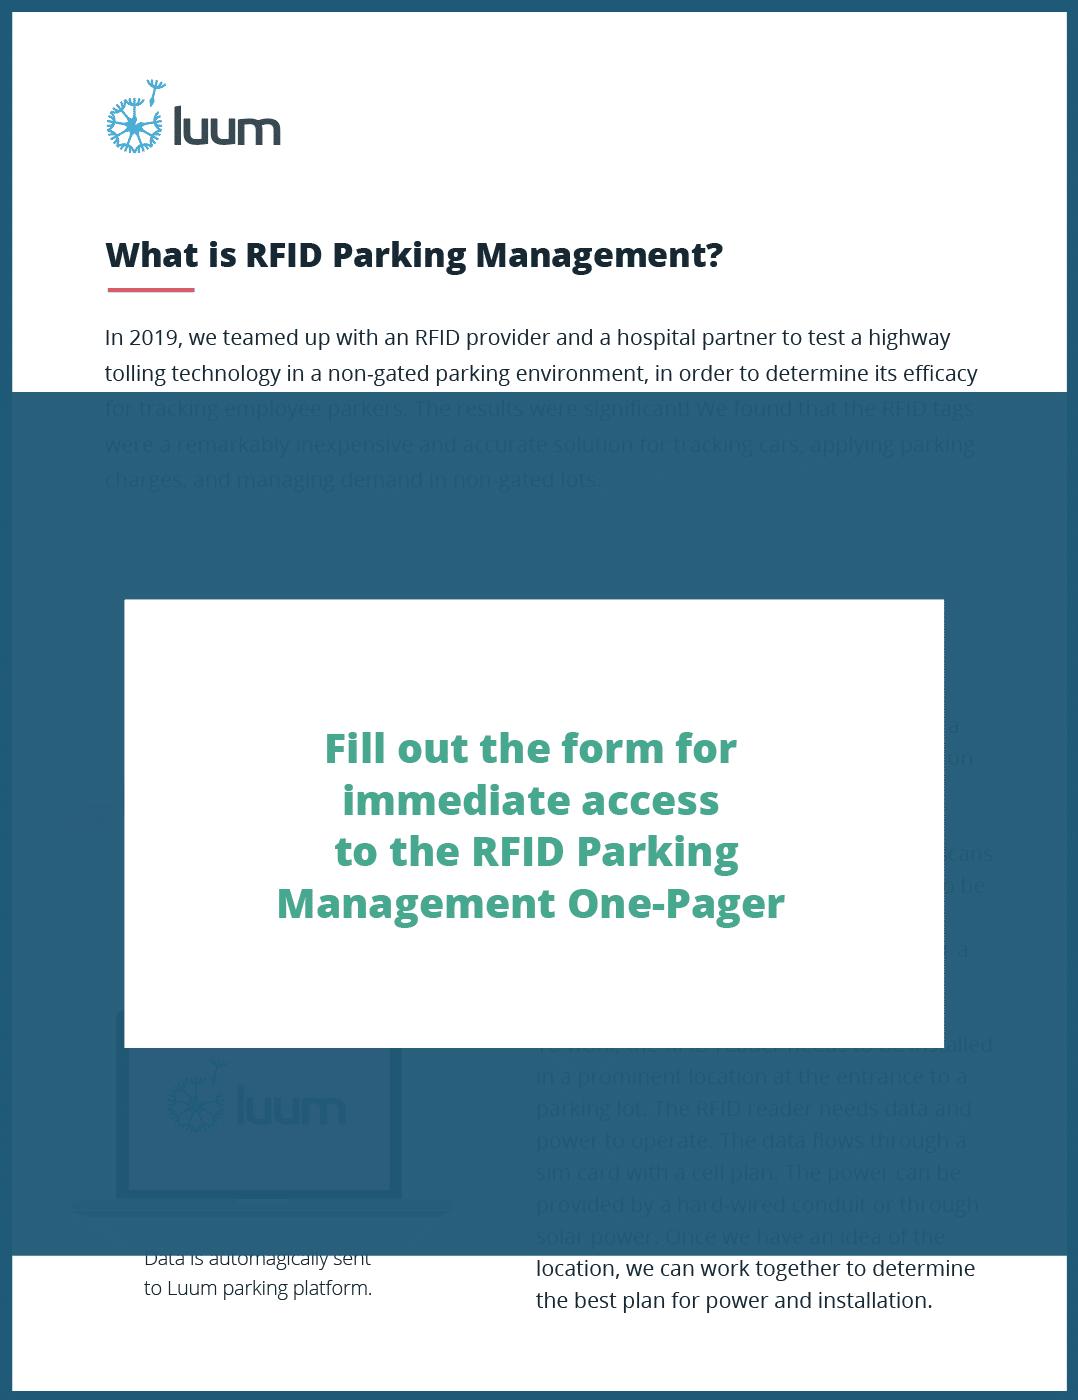 RFID Parking Solution